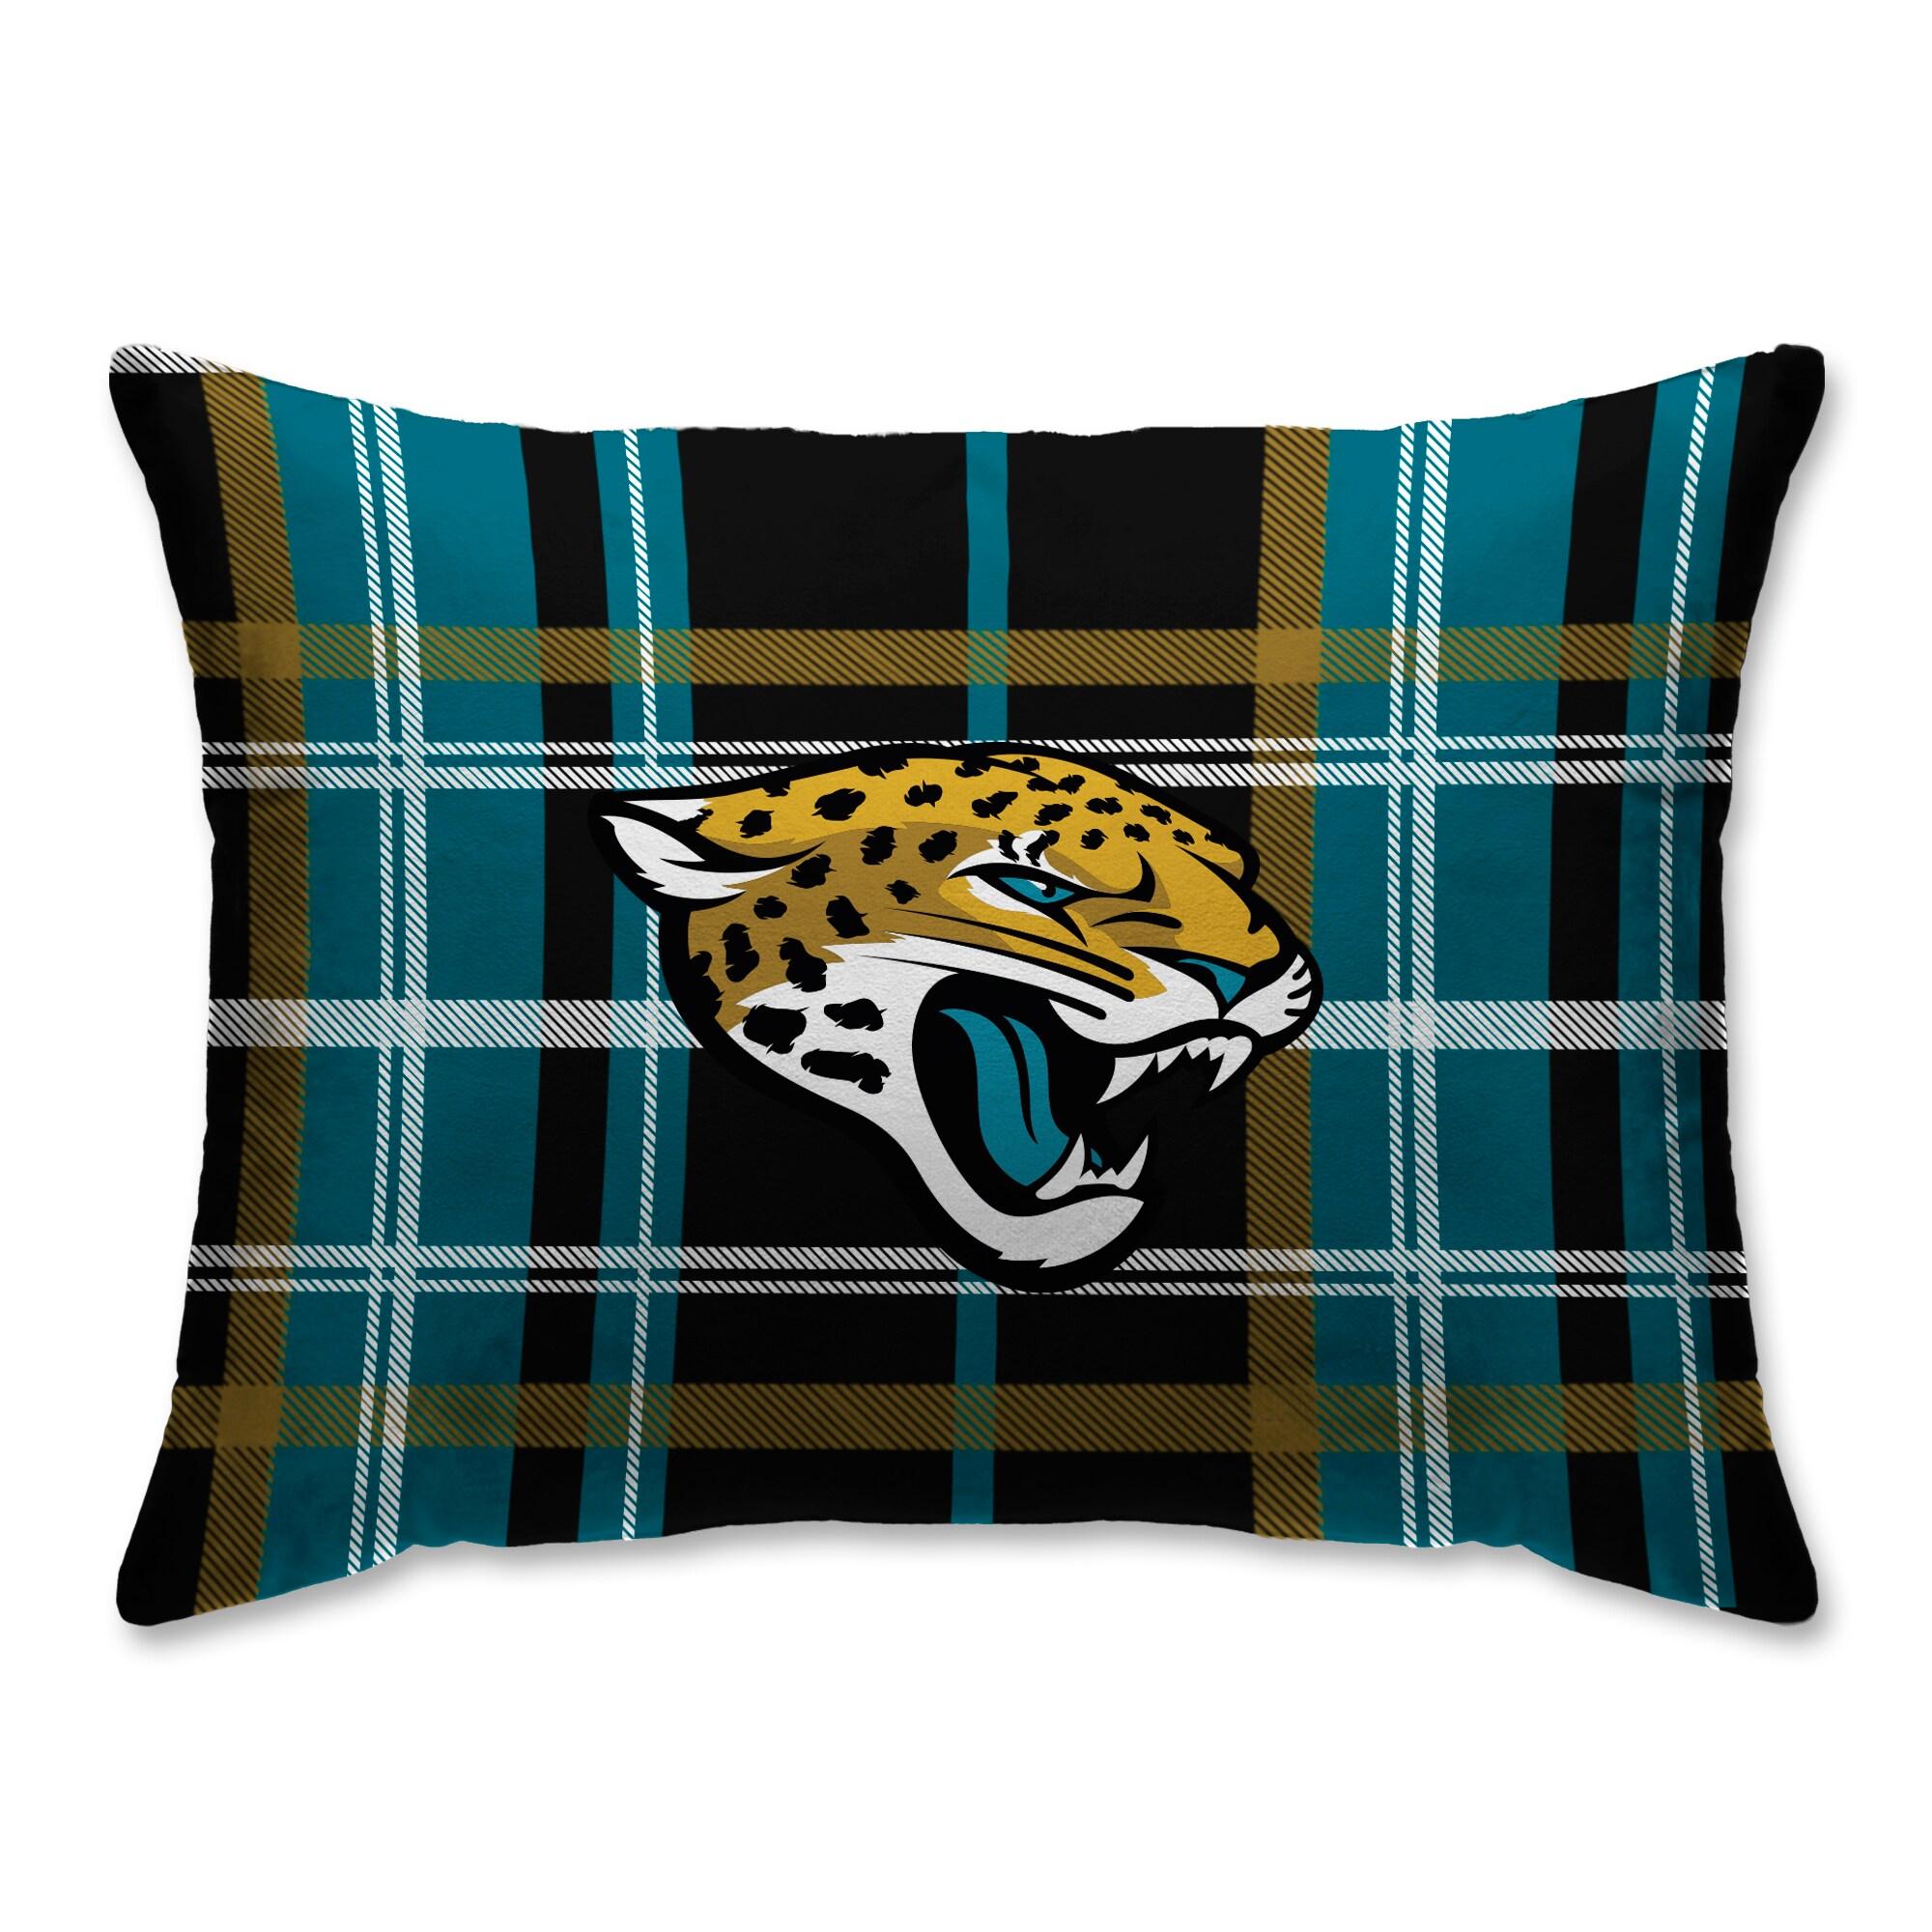 Jacksonville Jaguars Plaid Plush Sherpa Bed Pillow - Green